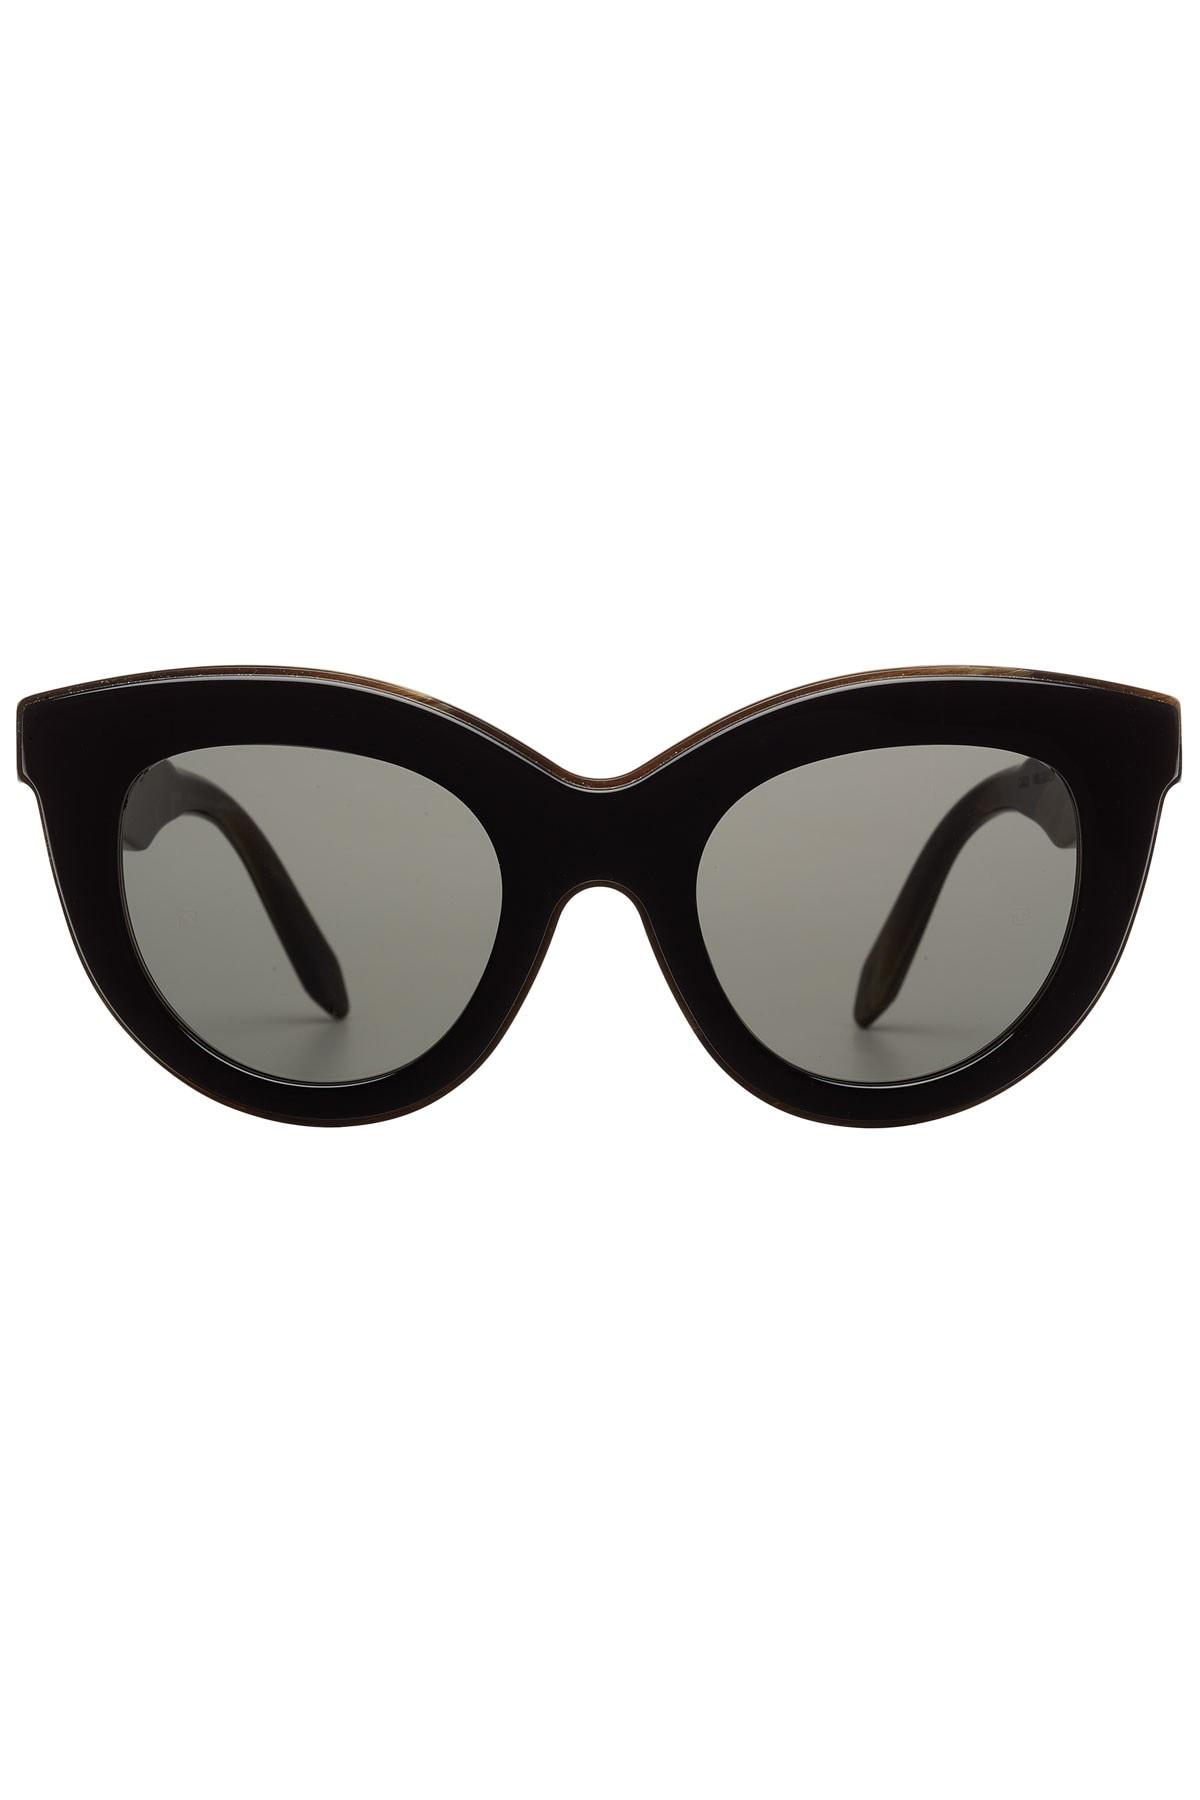 victoria beckham occhiali neri